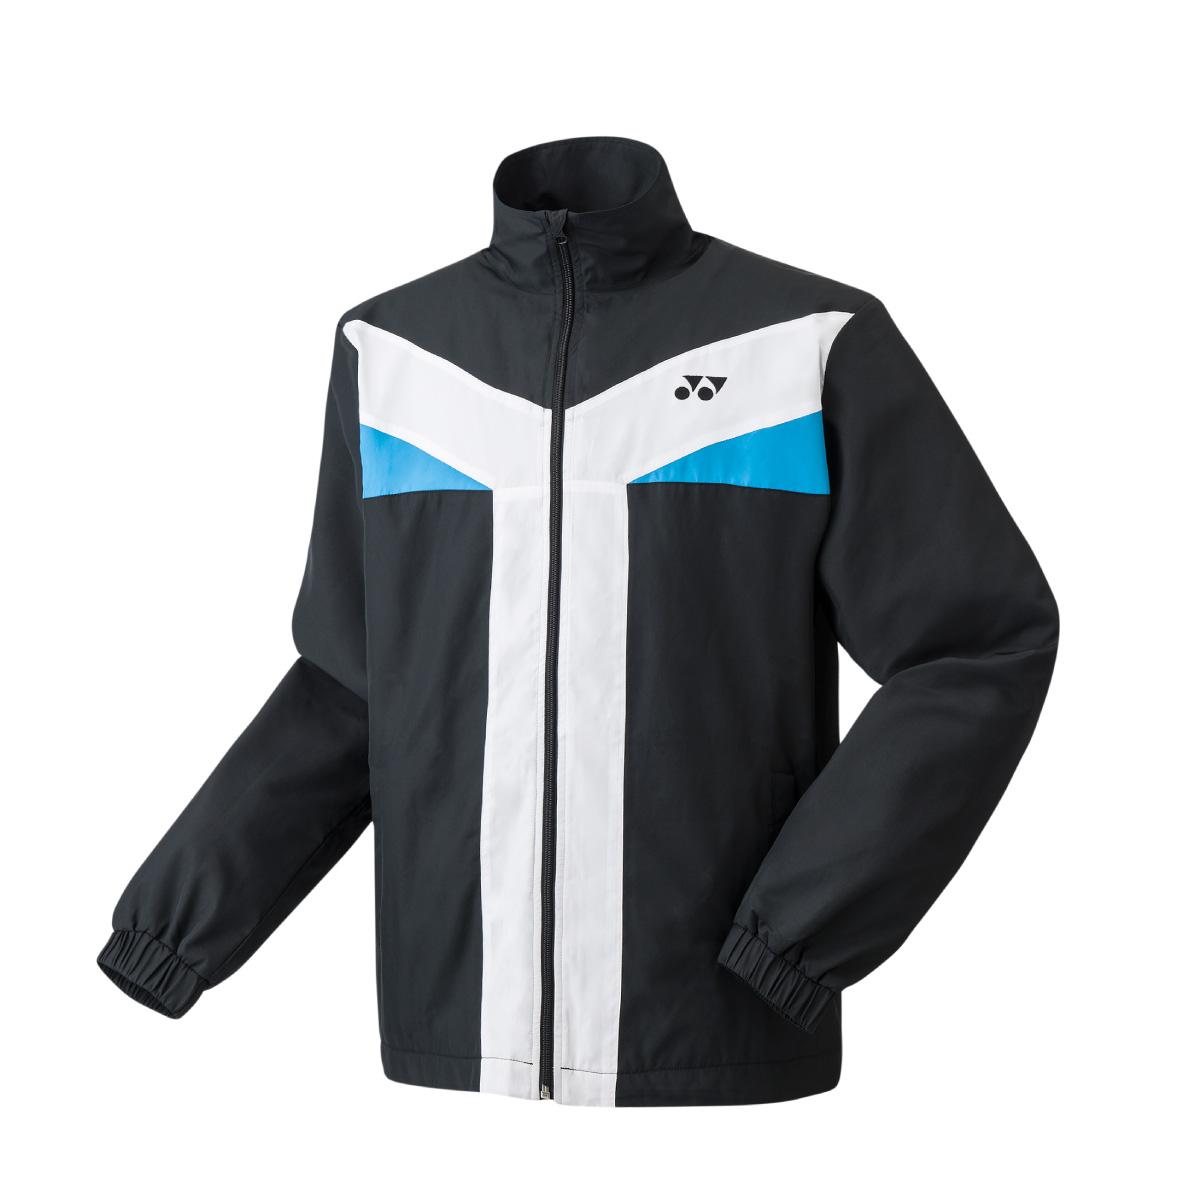 YONEX - Men's Warm-up Jacket, Club Team #YM0020Detailbild - 0